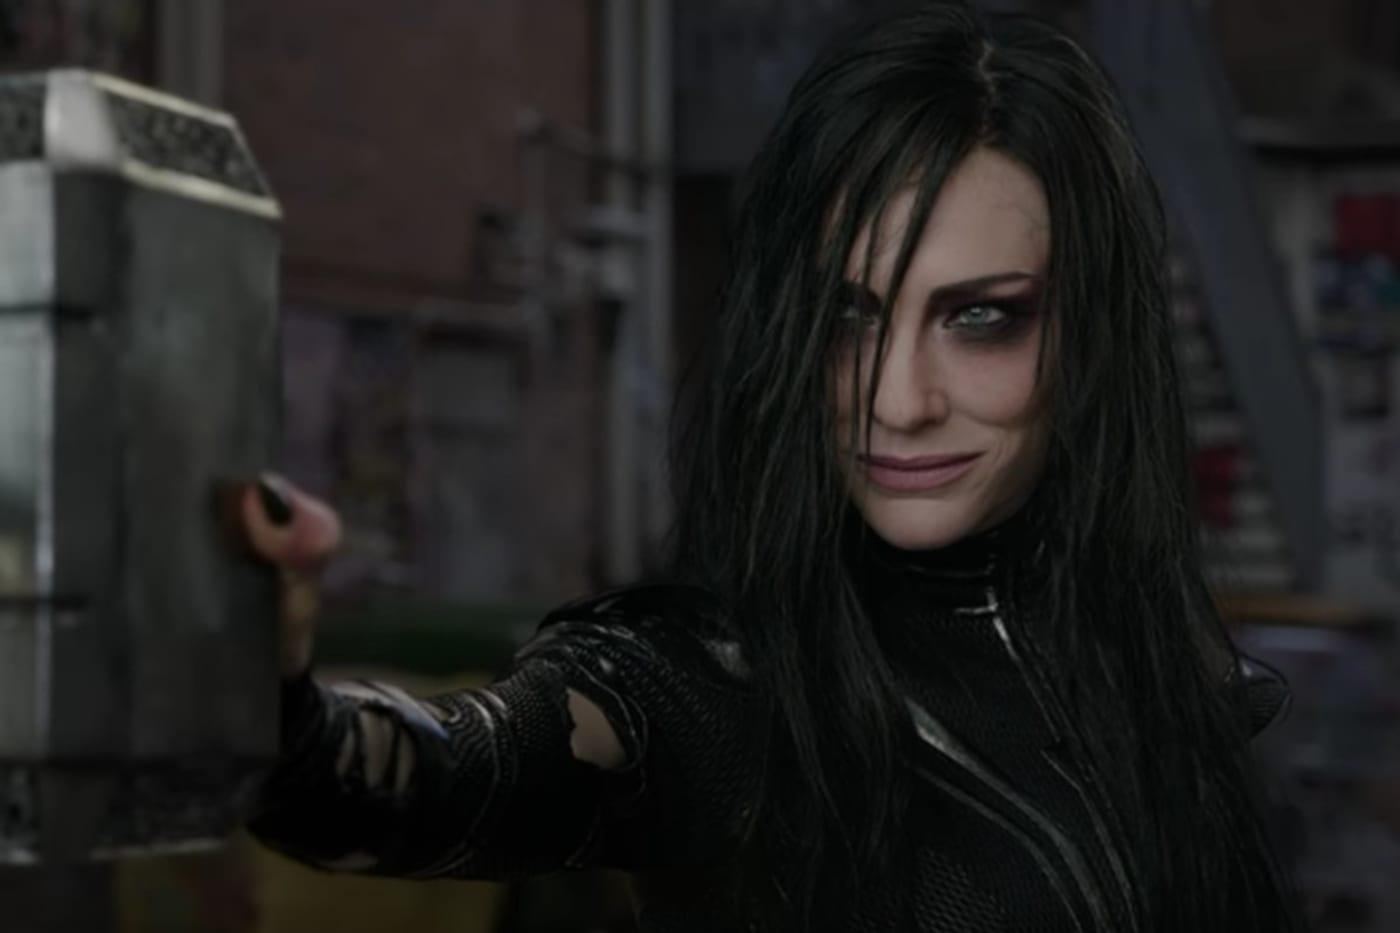 Cate Blanchett as Hela in 'Thor: Ragnarok'